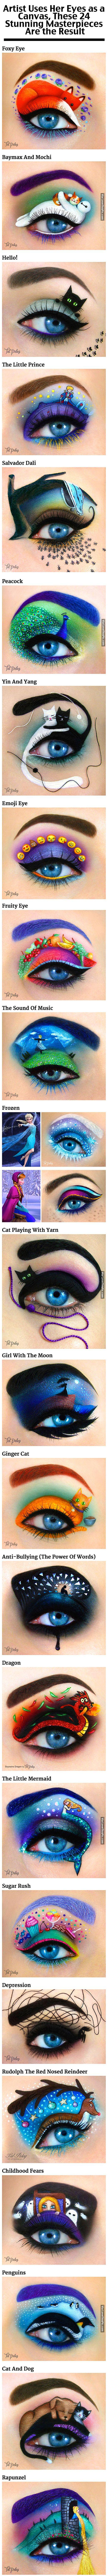 Artist Uses Her Eyes As A Canvas beautiful makeup art artistic amazing cosmetics makeup art